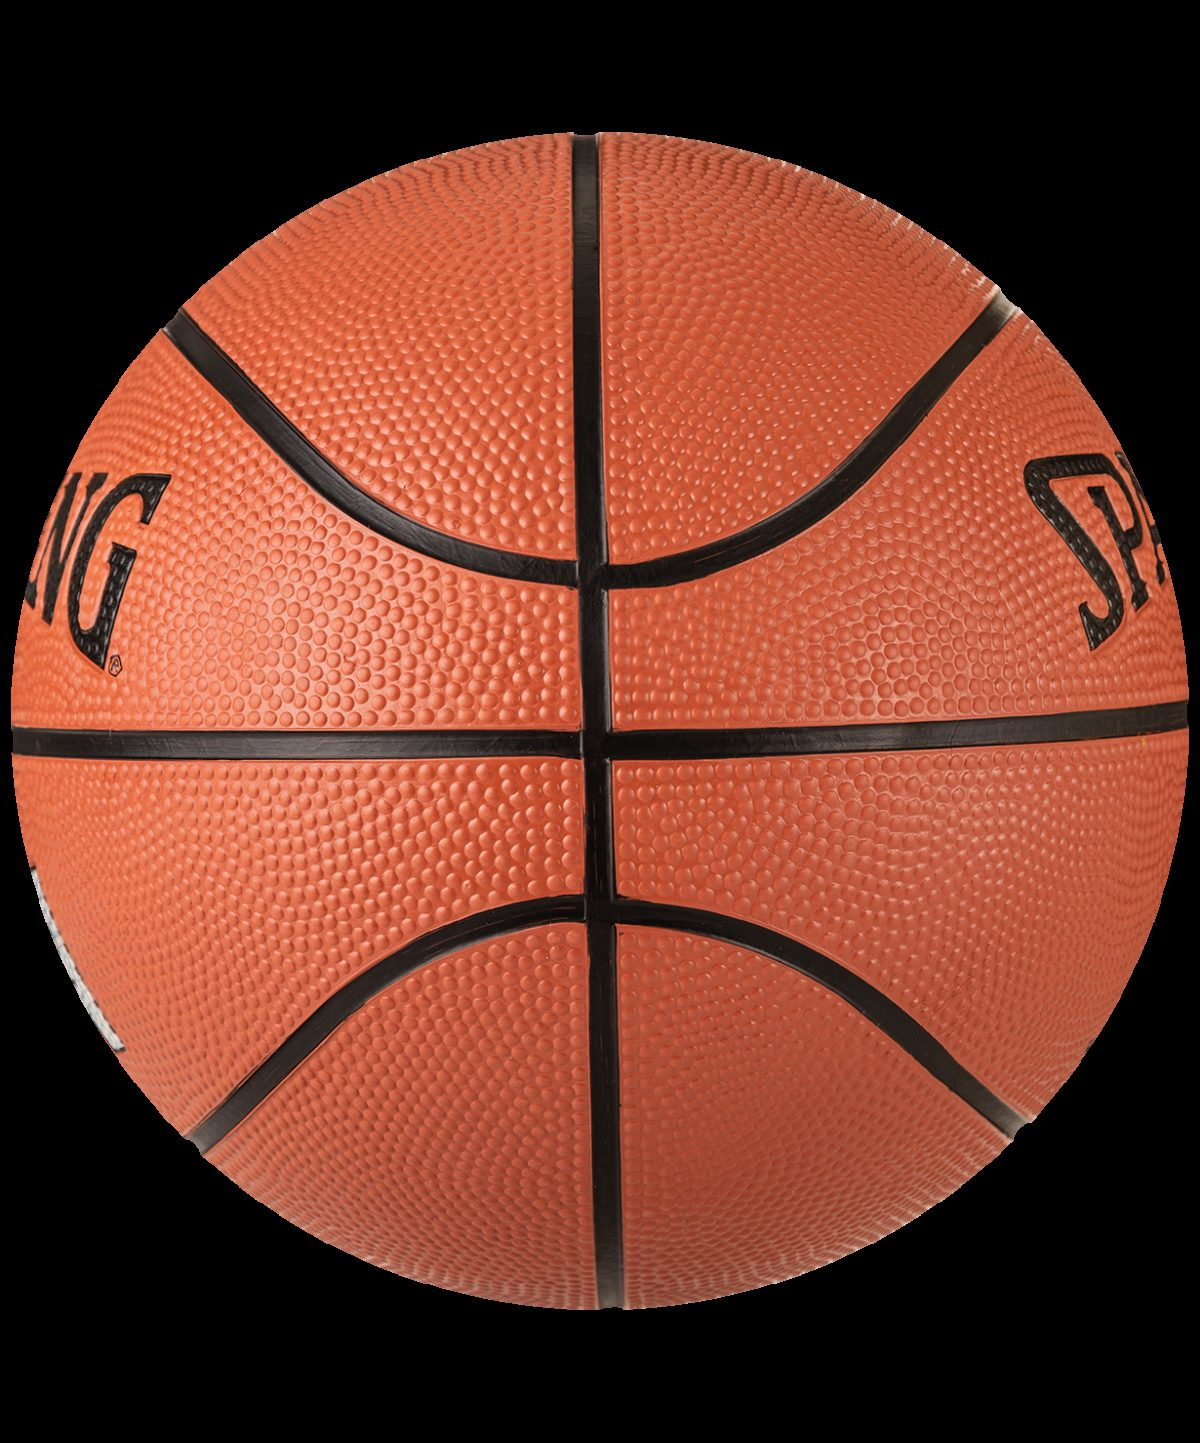 SPALDING NBA Silver Мяч баскетбольный  83016Z №7 - 3